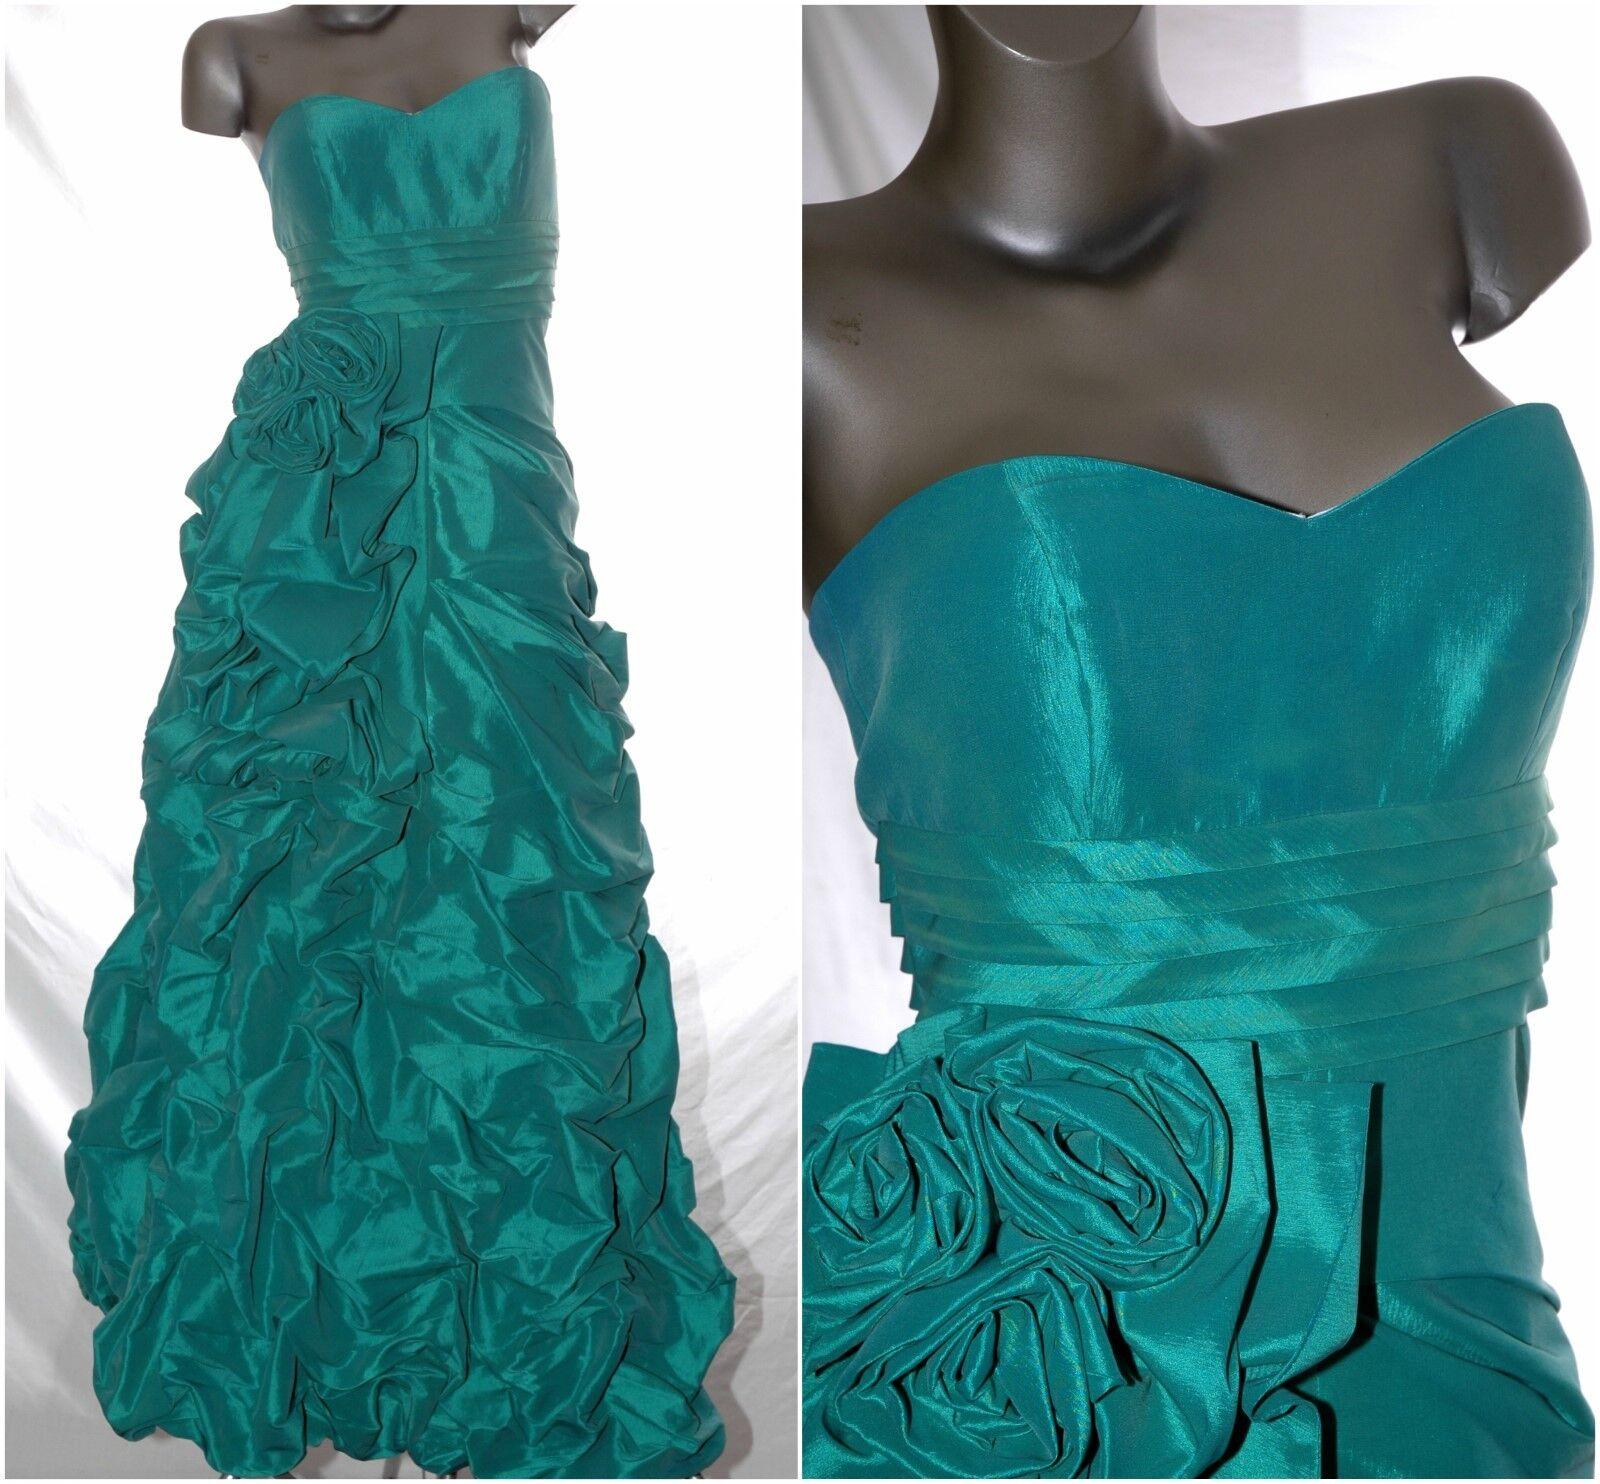 Prom DRESS Emerald STRAPLESS Grad Gown Pageant Gala Wedding Formal NWT JOVANI 10